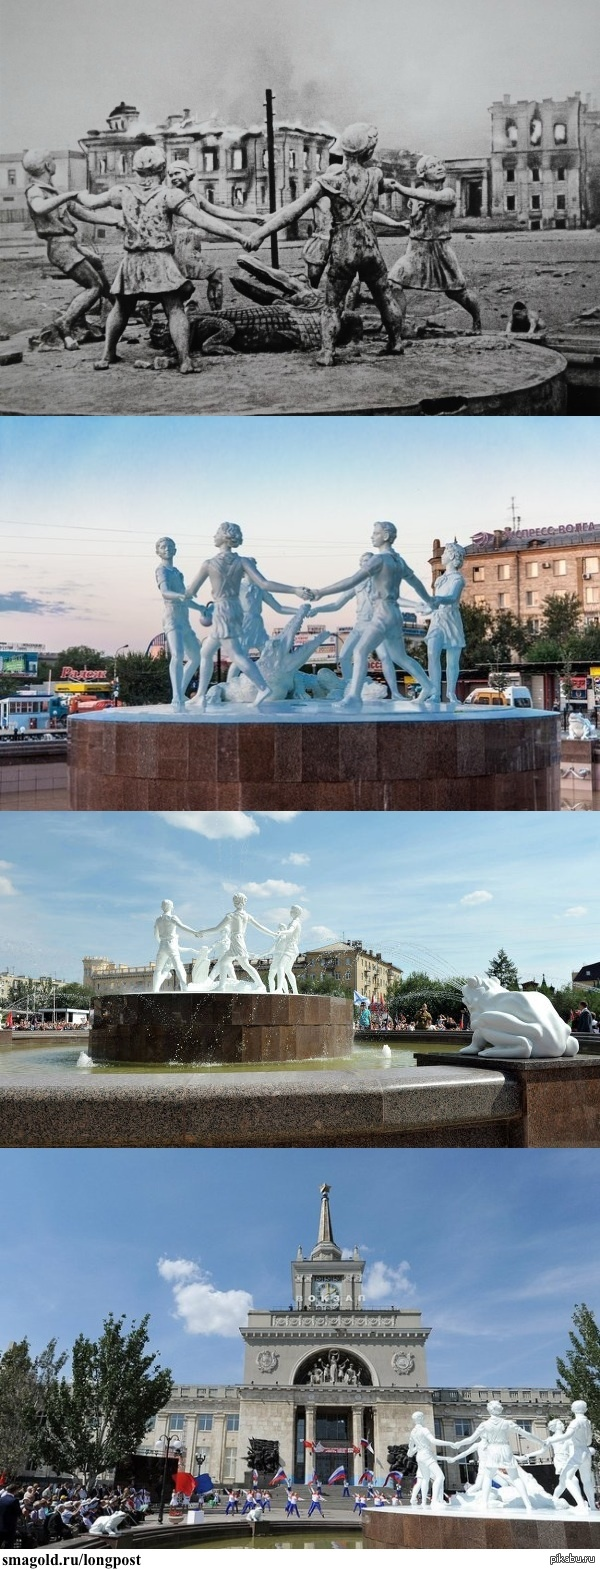 http://s.pikabu.ru/post_img/2013/08/24/7/1377335521_518045860.jpg